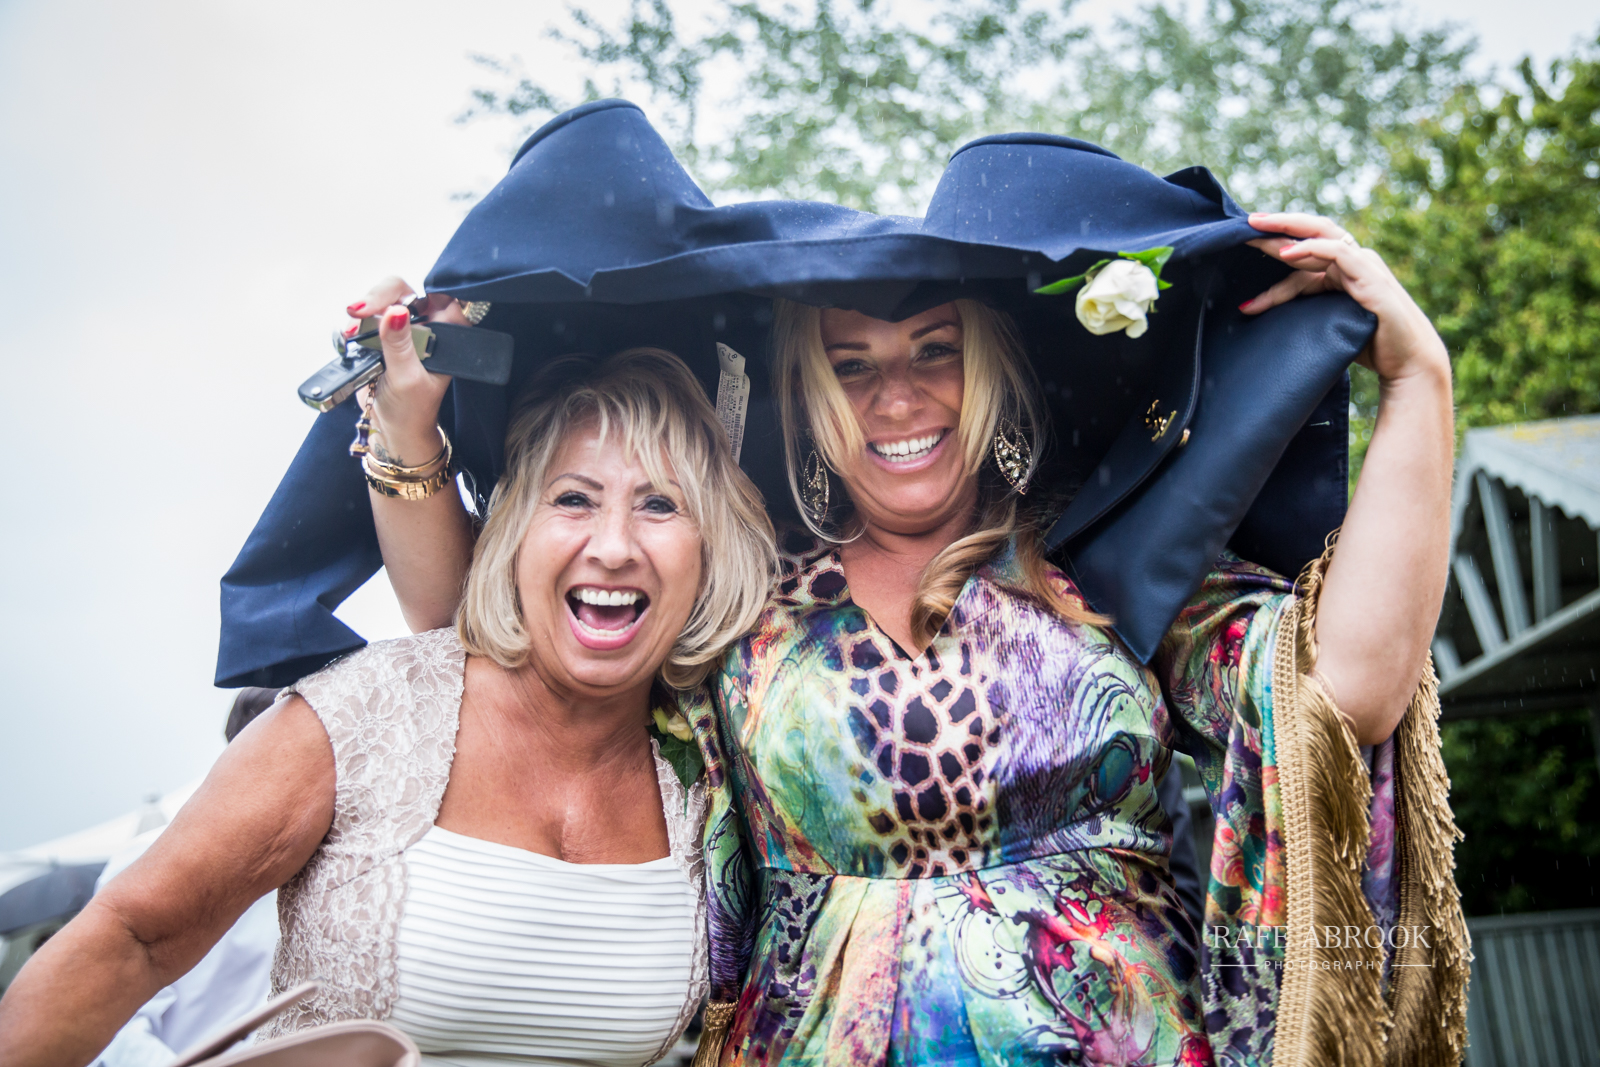 cley windmill wedding norfolk hertfordshire wedding photographer-1225.jpg